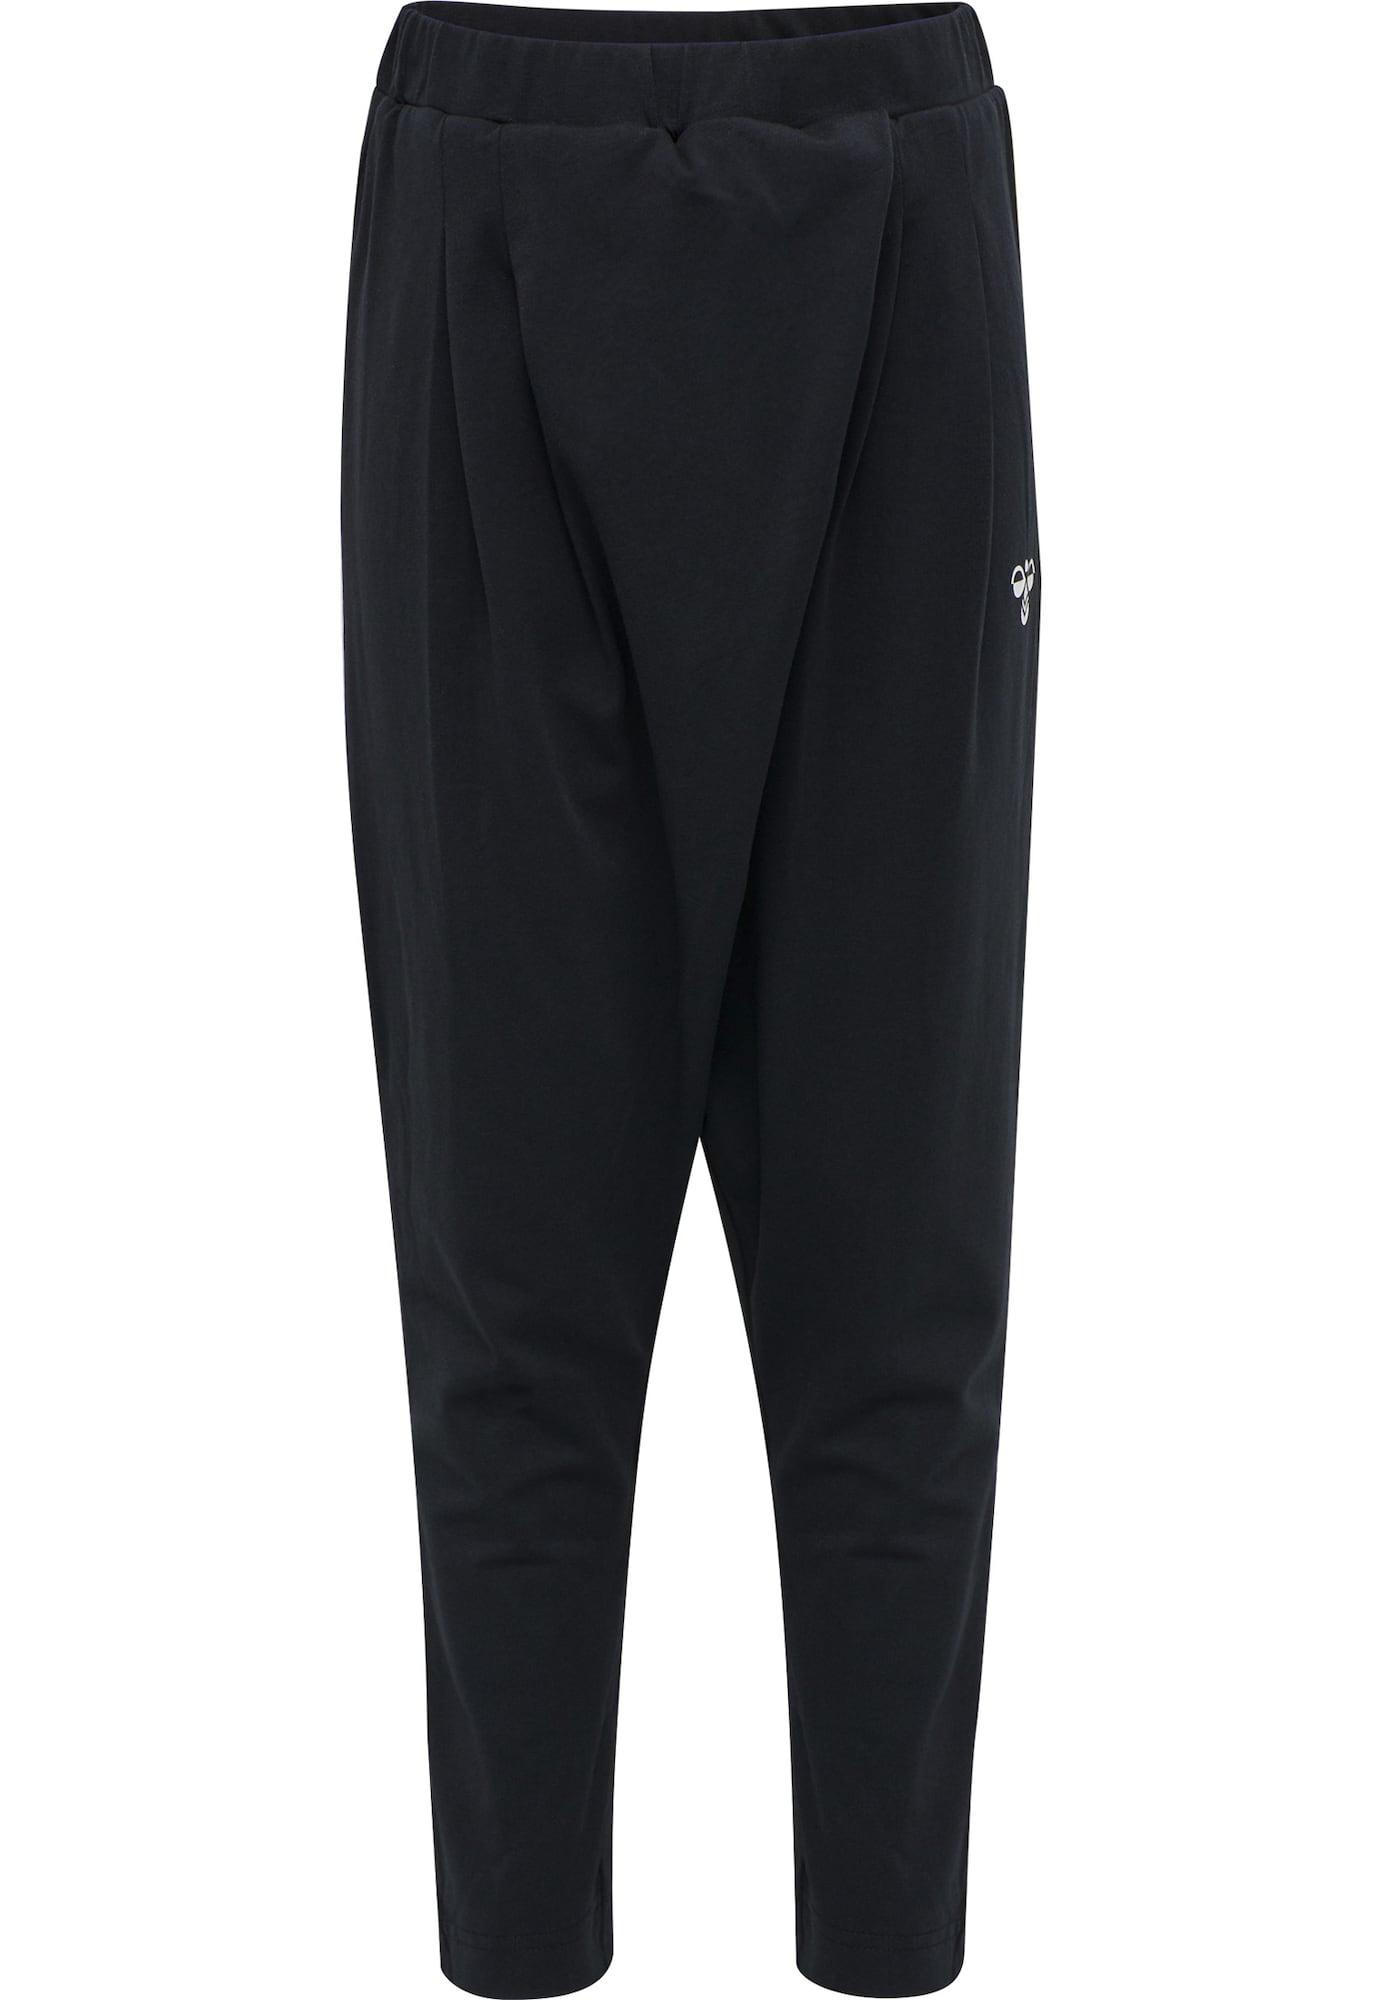 Hummel Sportinės kelnės 'Andrea' juoda / balta